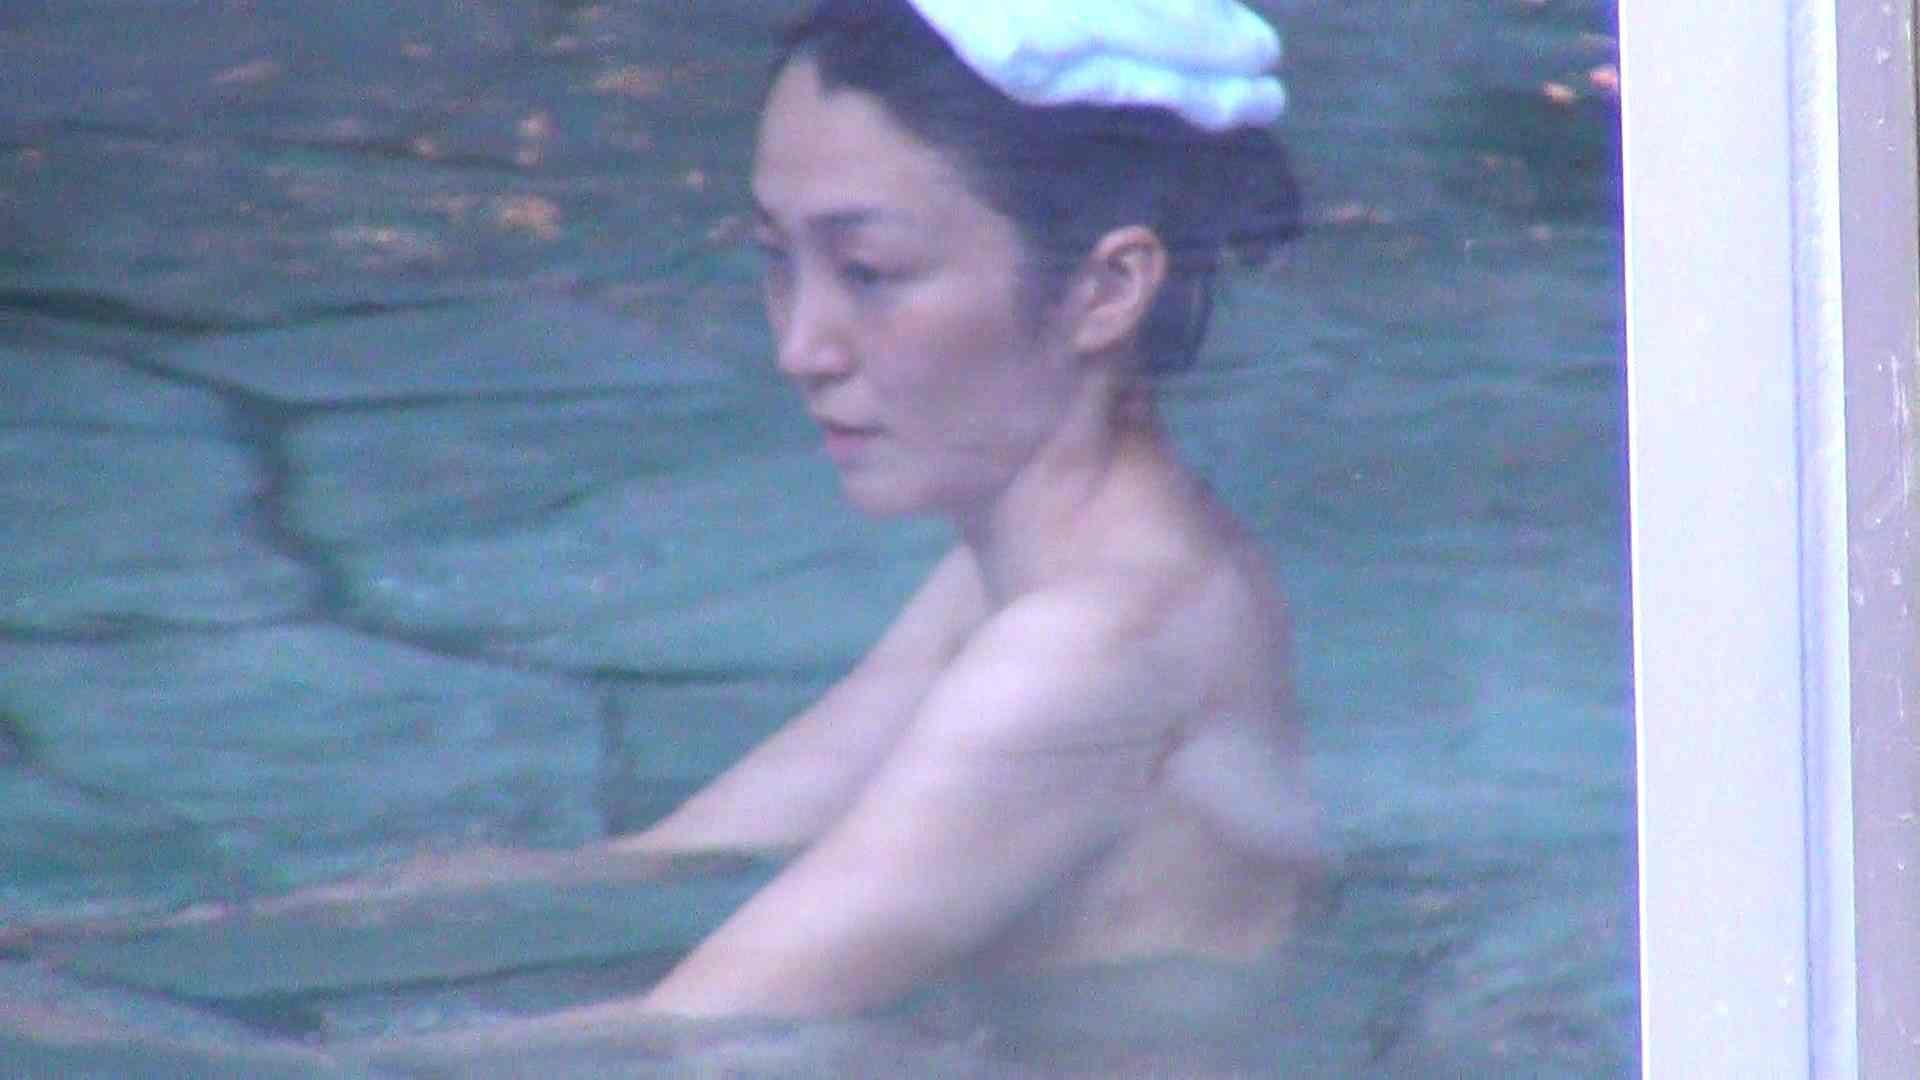 Aquaな露天風呂Vol.290 OL  109連発 28